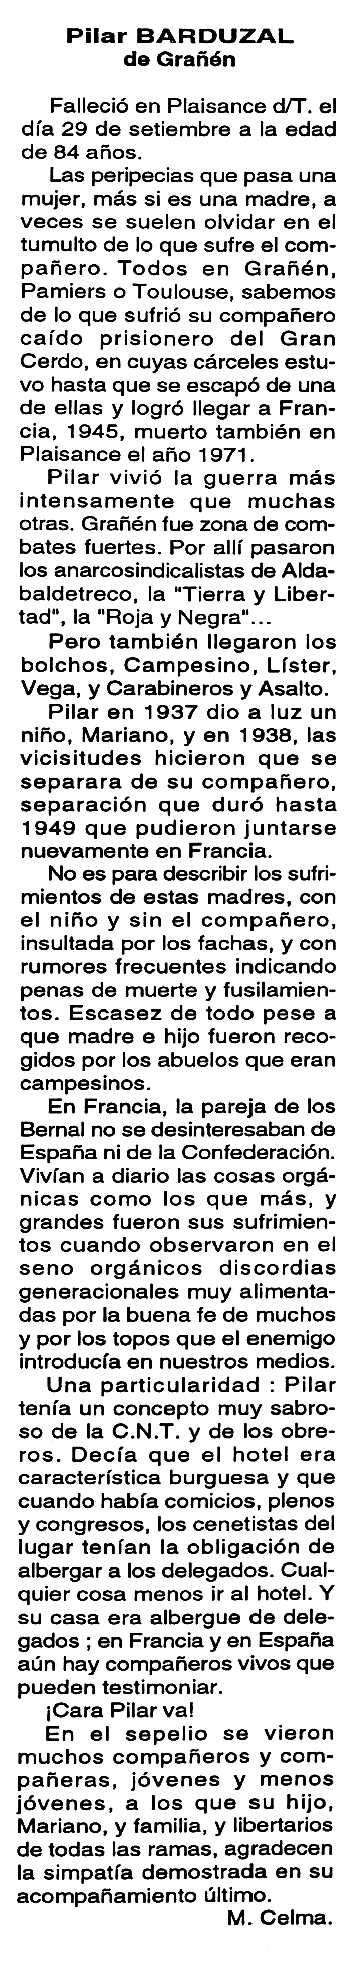 "Necrològica de Pilar Barduzal Oto apareguda en el periòdic tolosà ""Cenit"" del 29 de novembre de 1994"